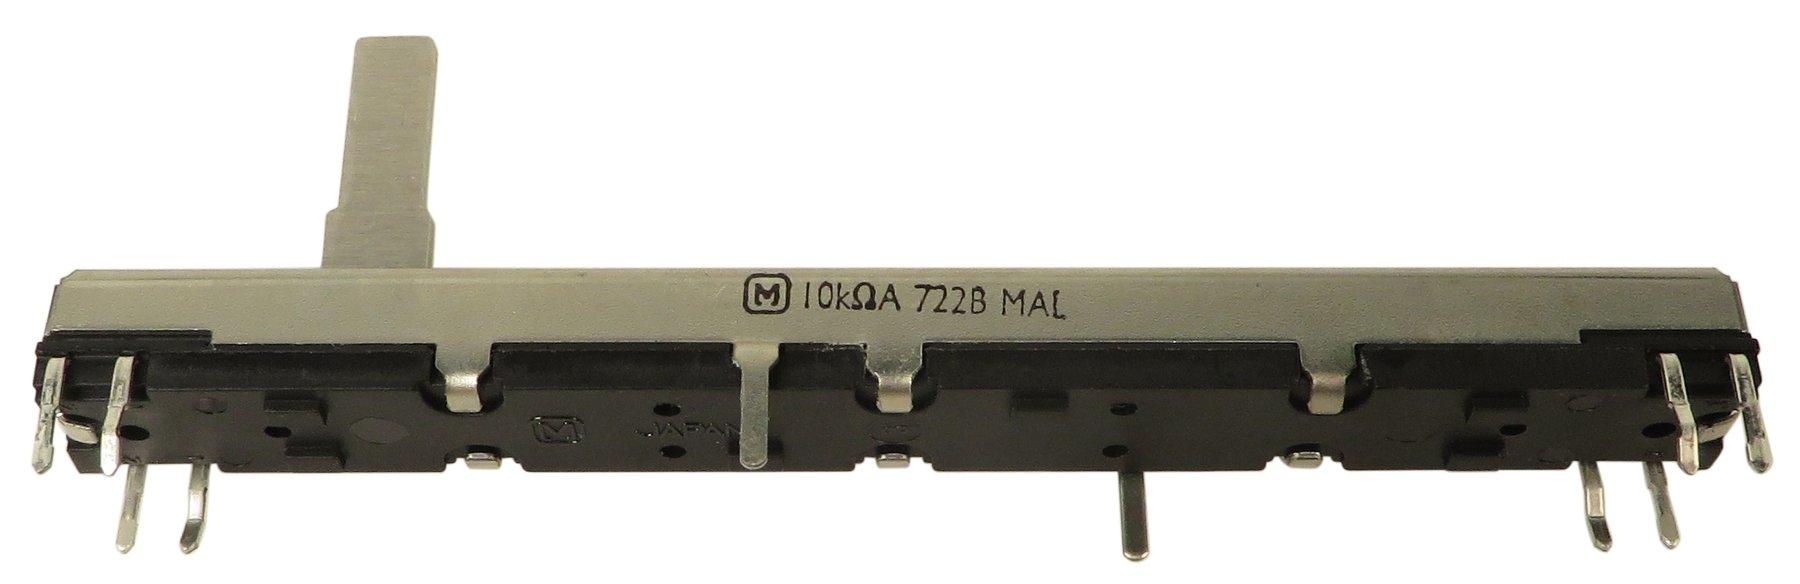 JBL 659-00007-00 JBL Speaker Stereo Pot 659-00007-00